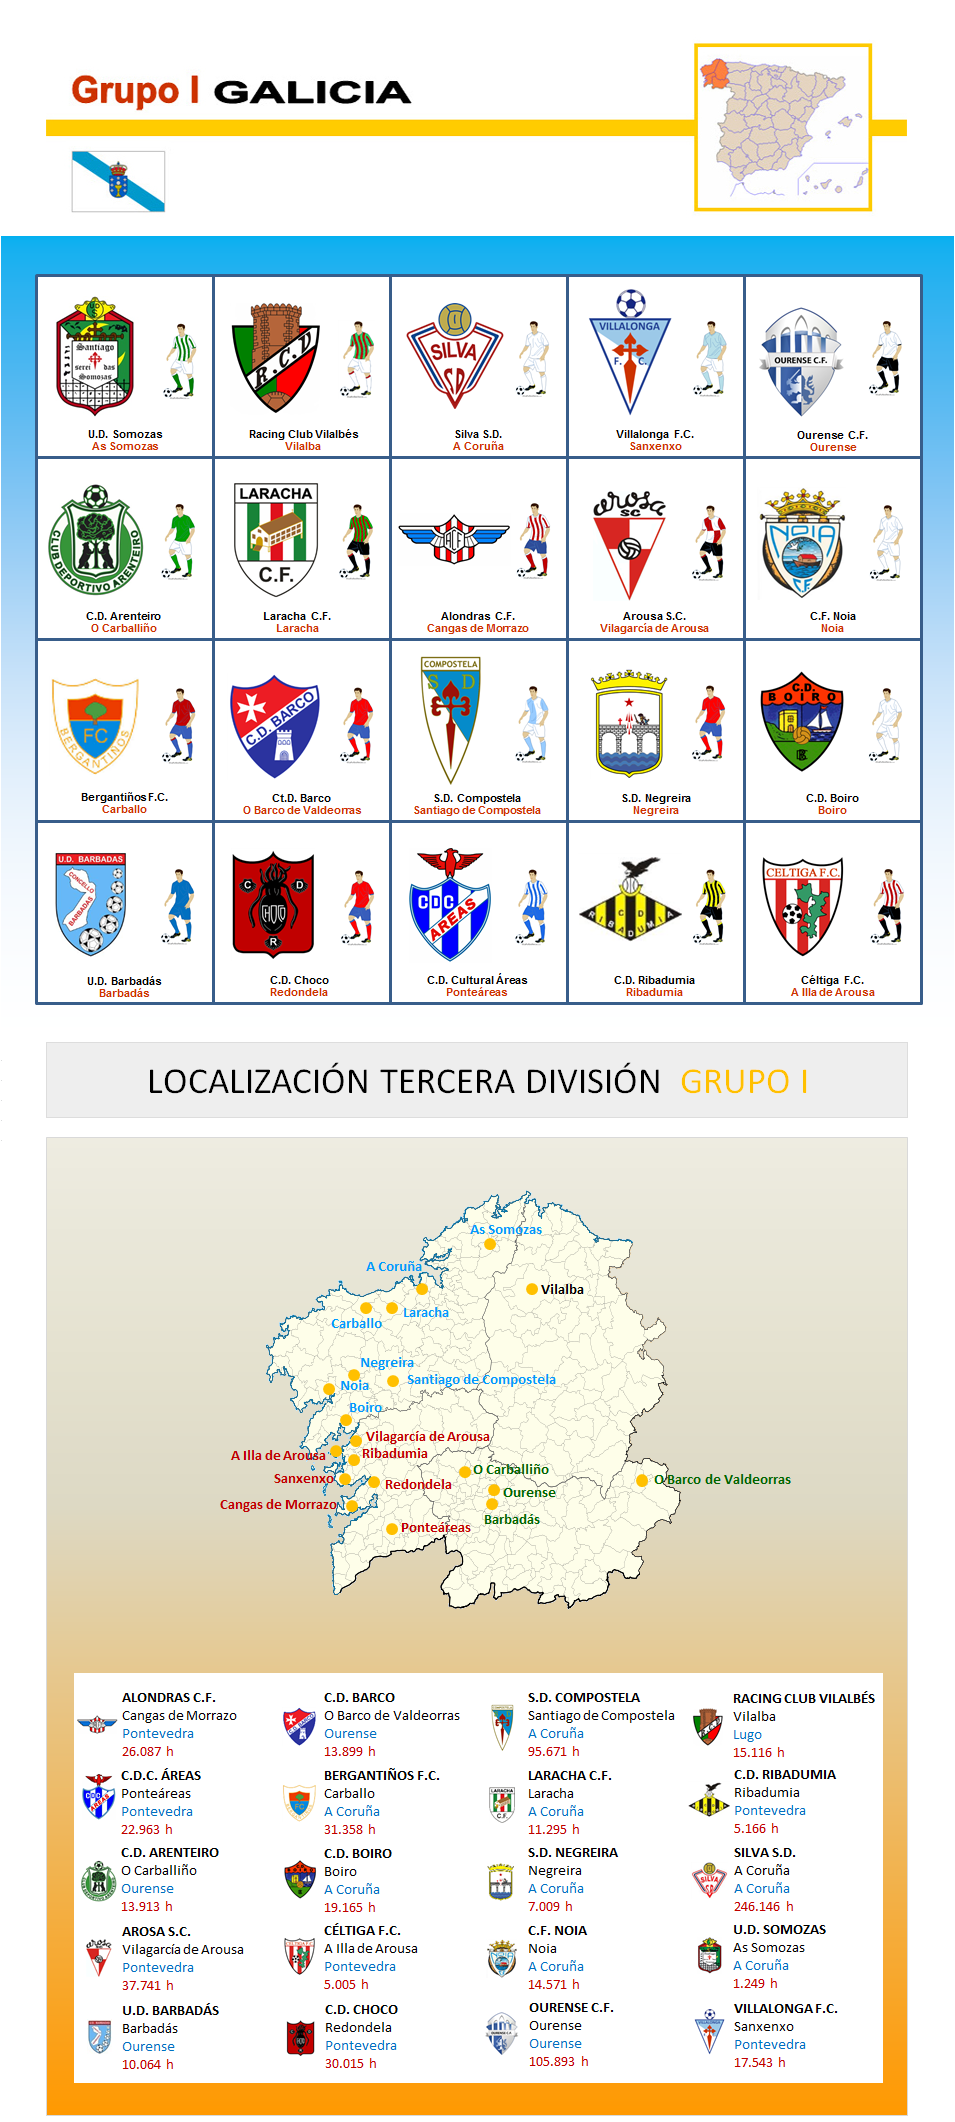 tercera division grupo 1 galicia